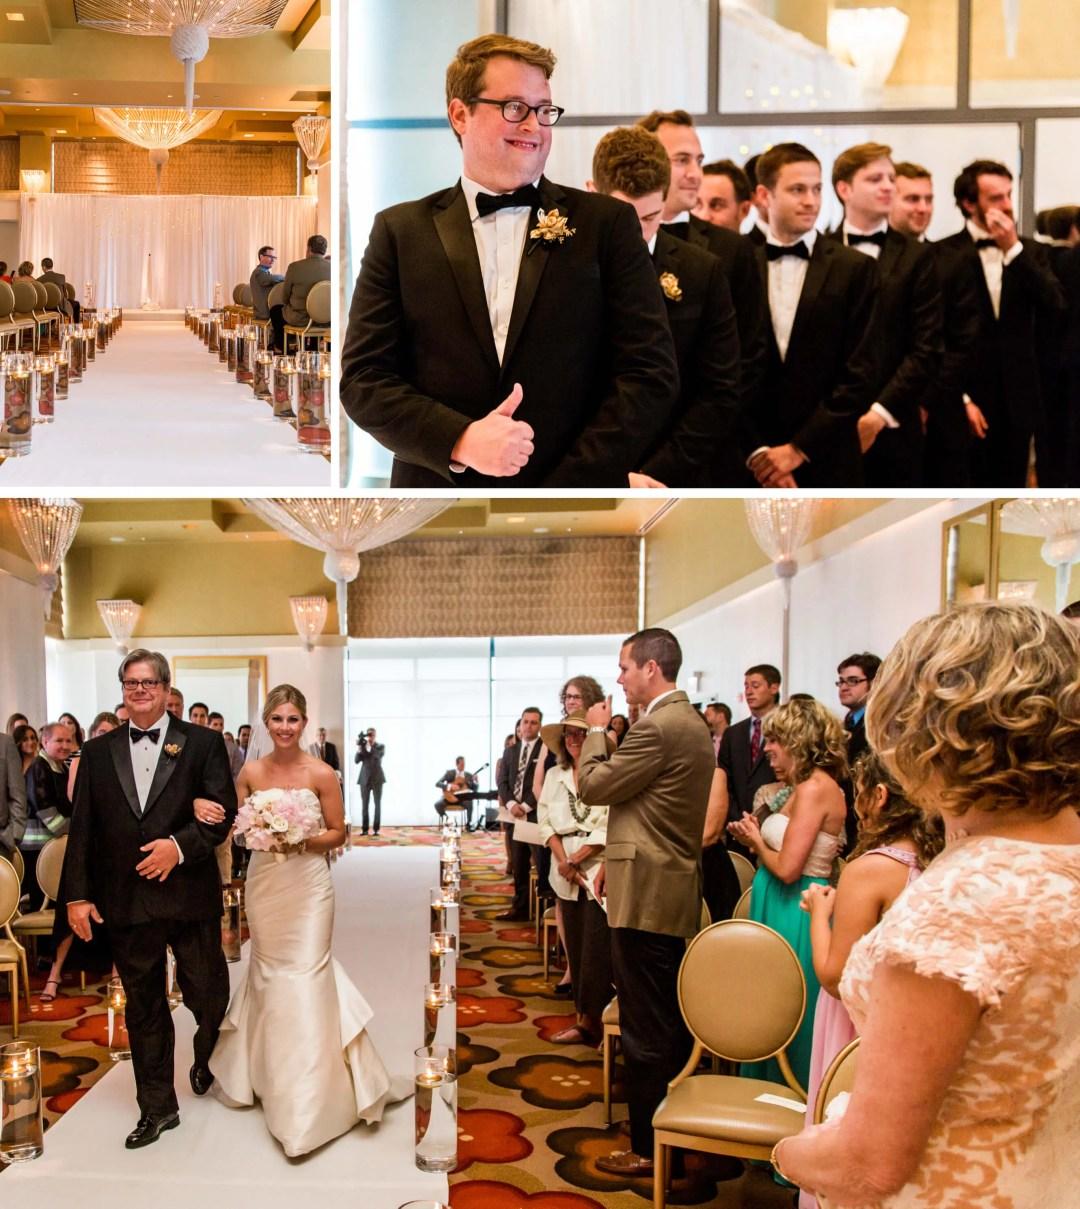 Kimpton Hotel Palomar wedding Ceremony - Sussex wedding photographer